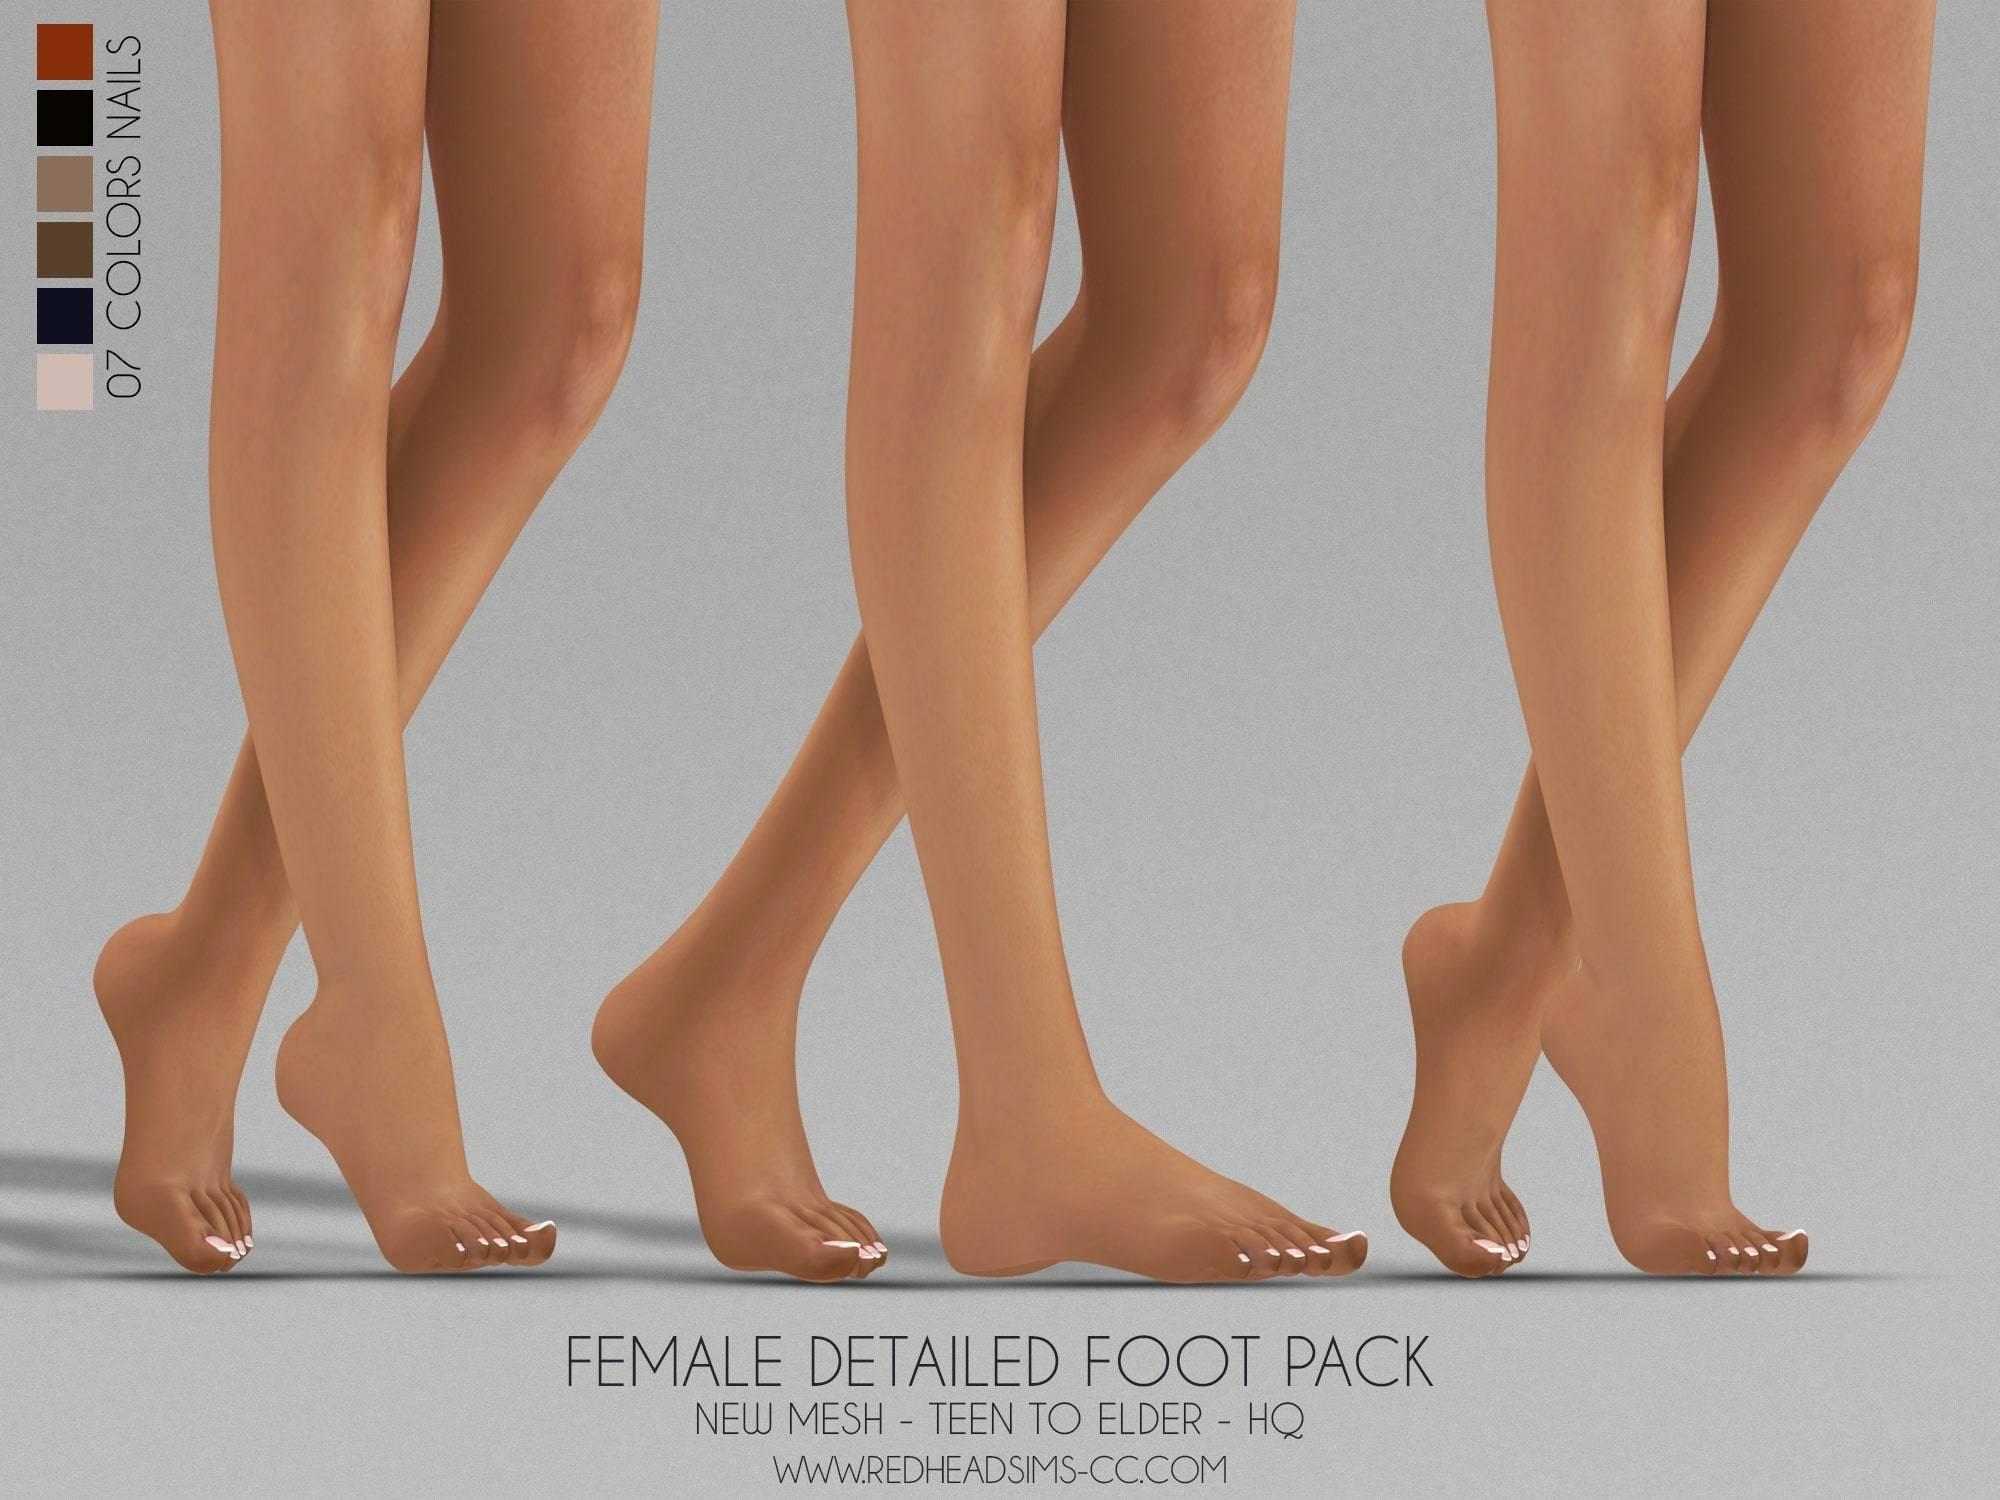 Маски для ног - FEMALE DETAILED FOOT PACK